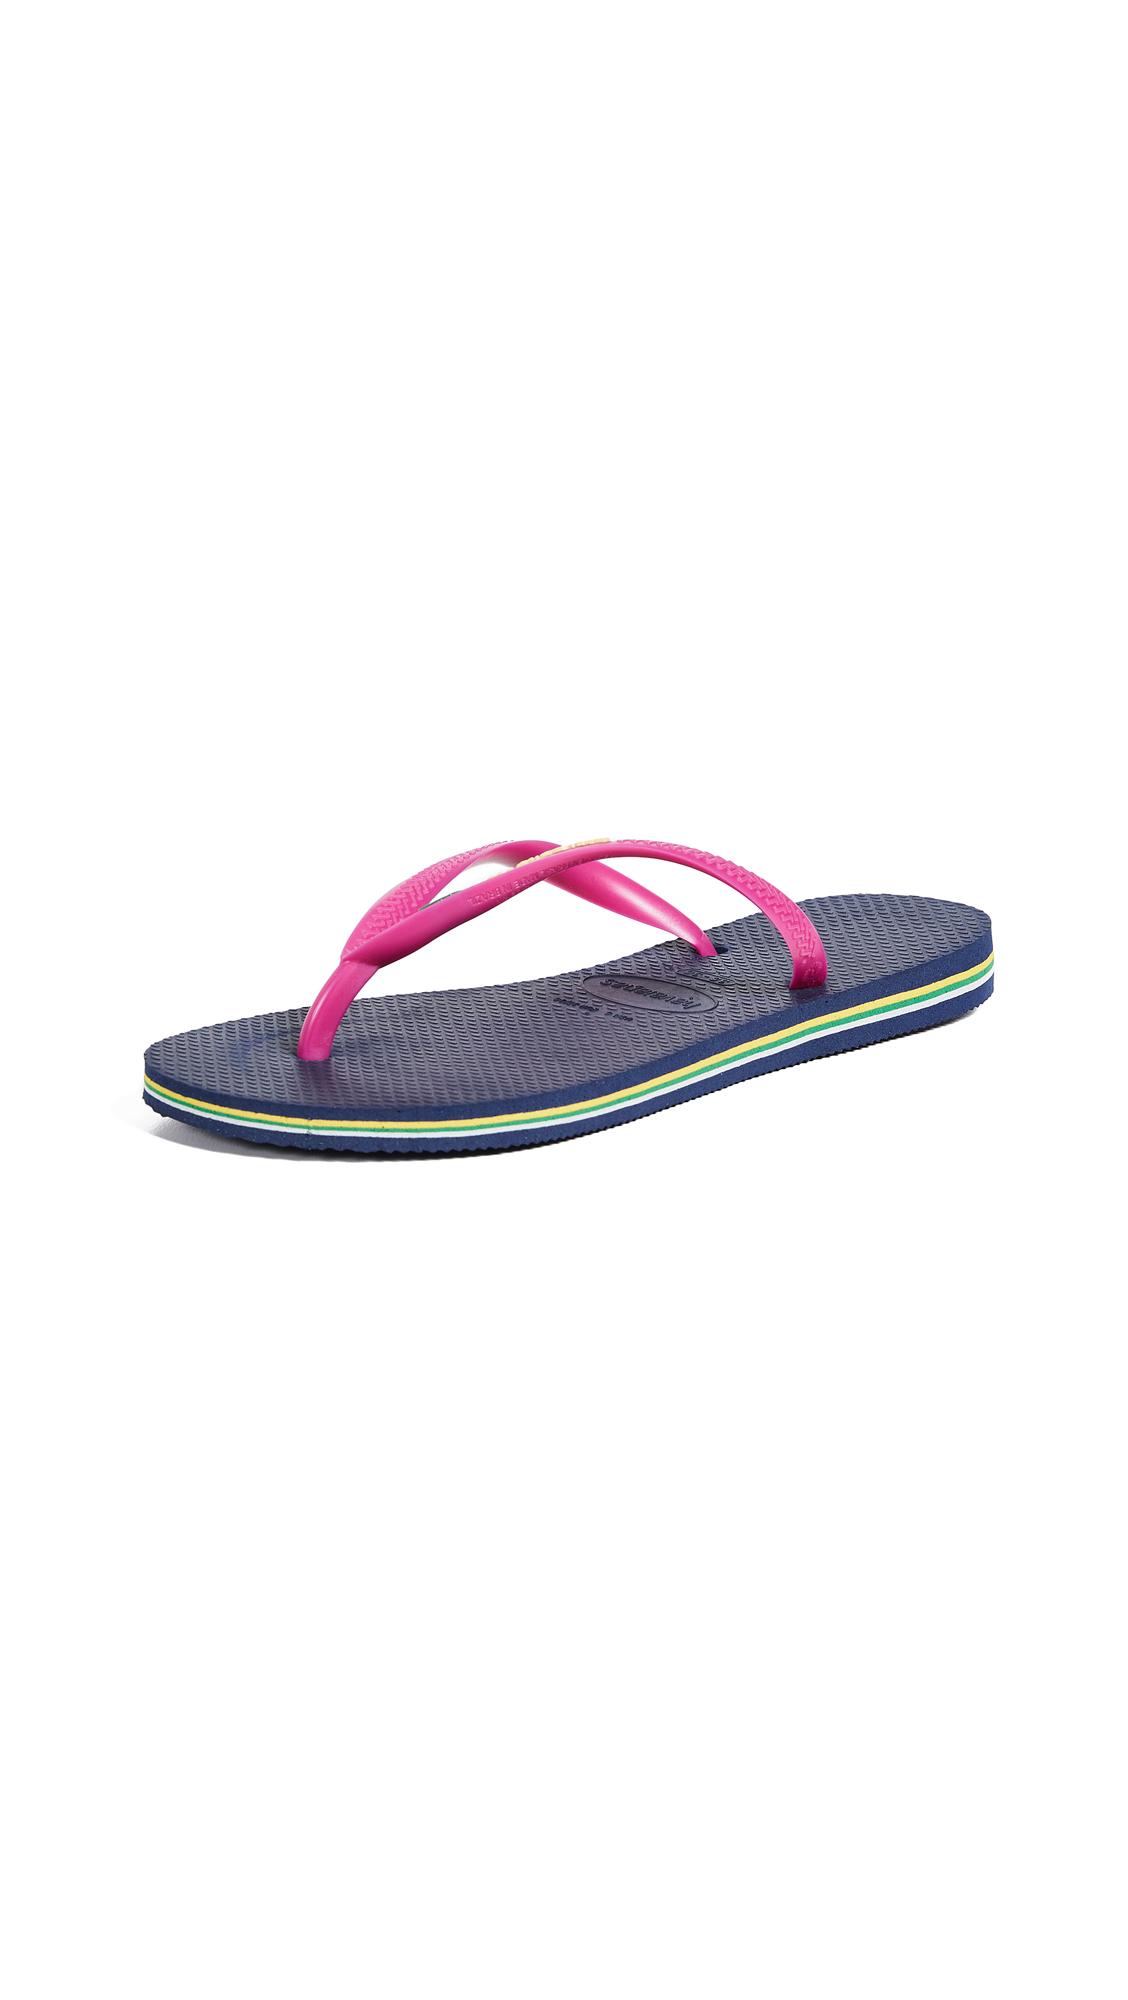 Havaianas Slim Brazil Flip Flops - Navy Blue